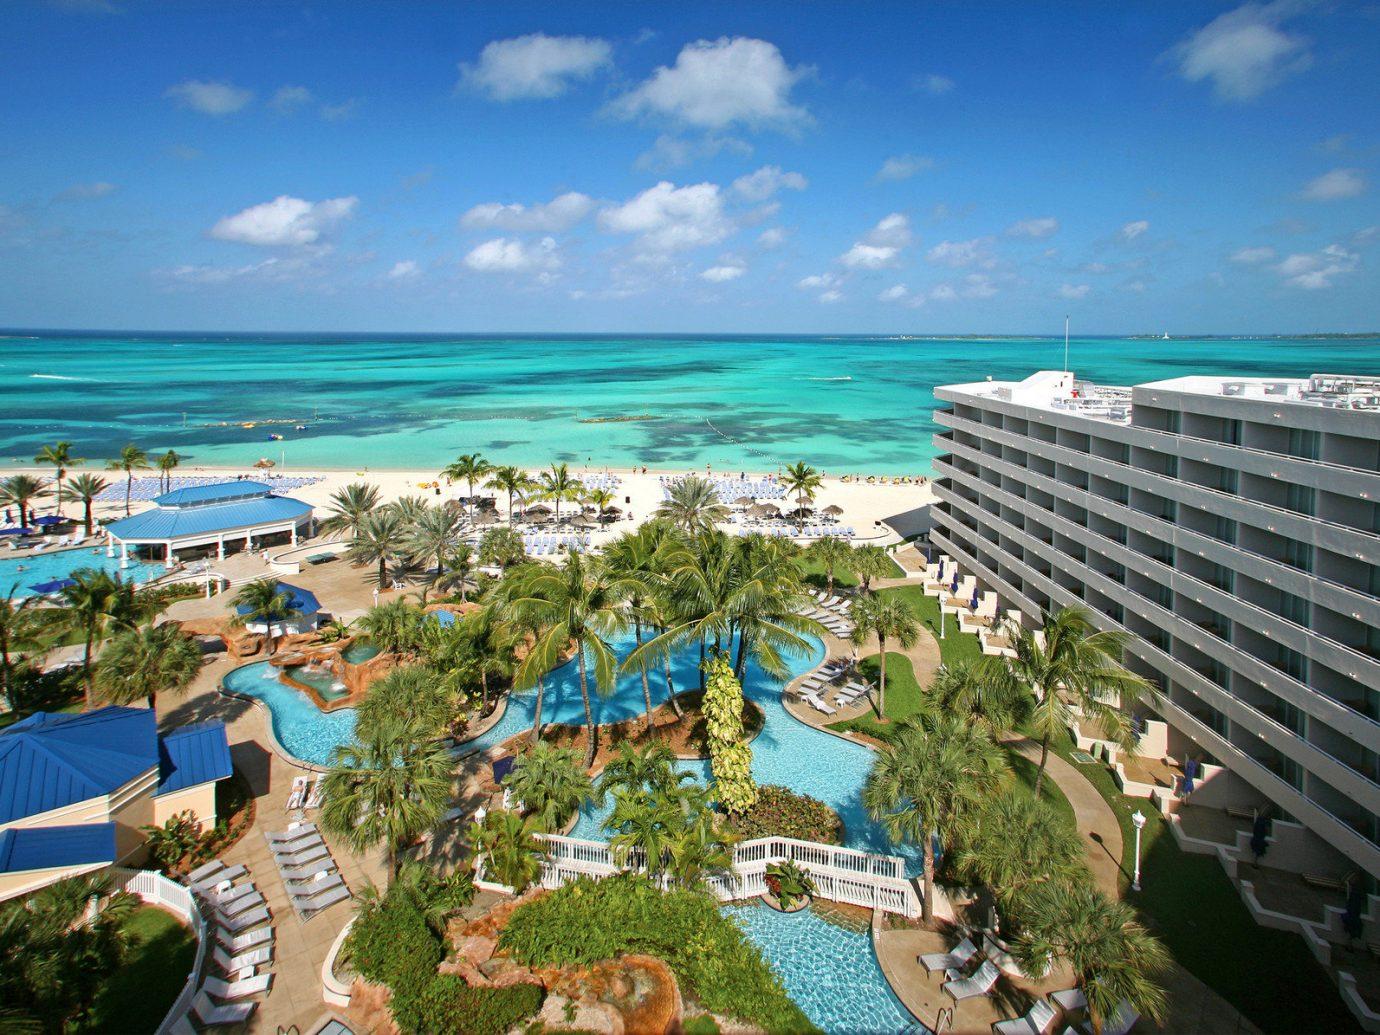 Aerial view of Meliá Nassau Beach